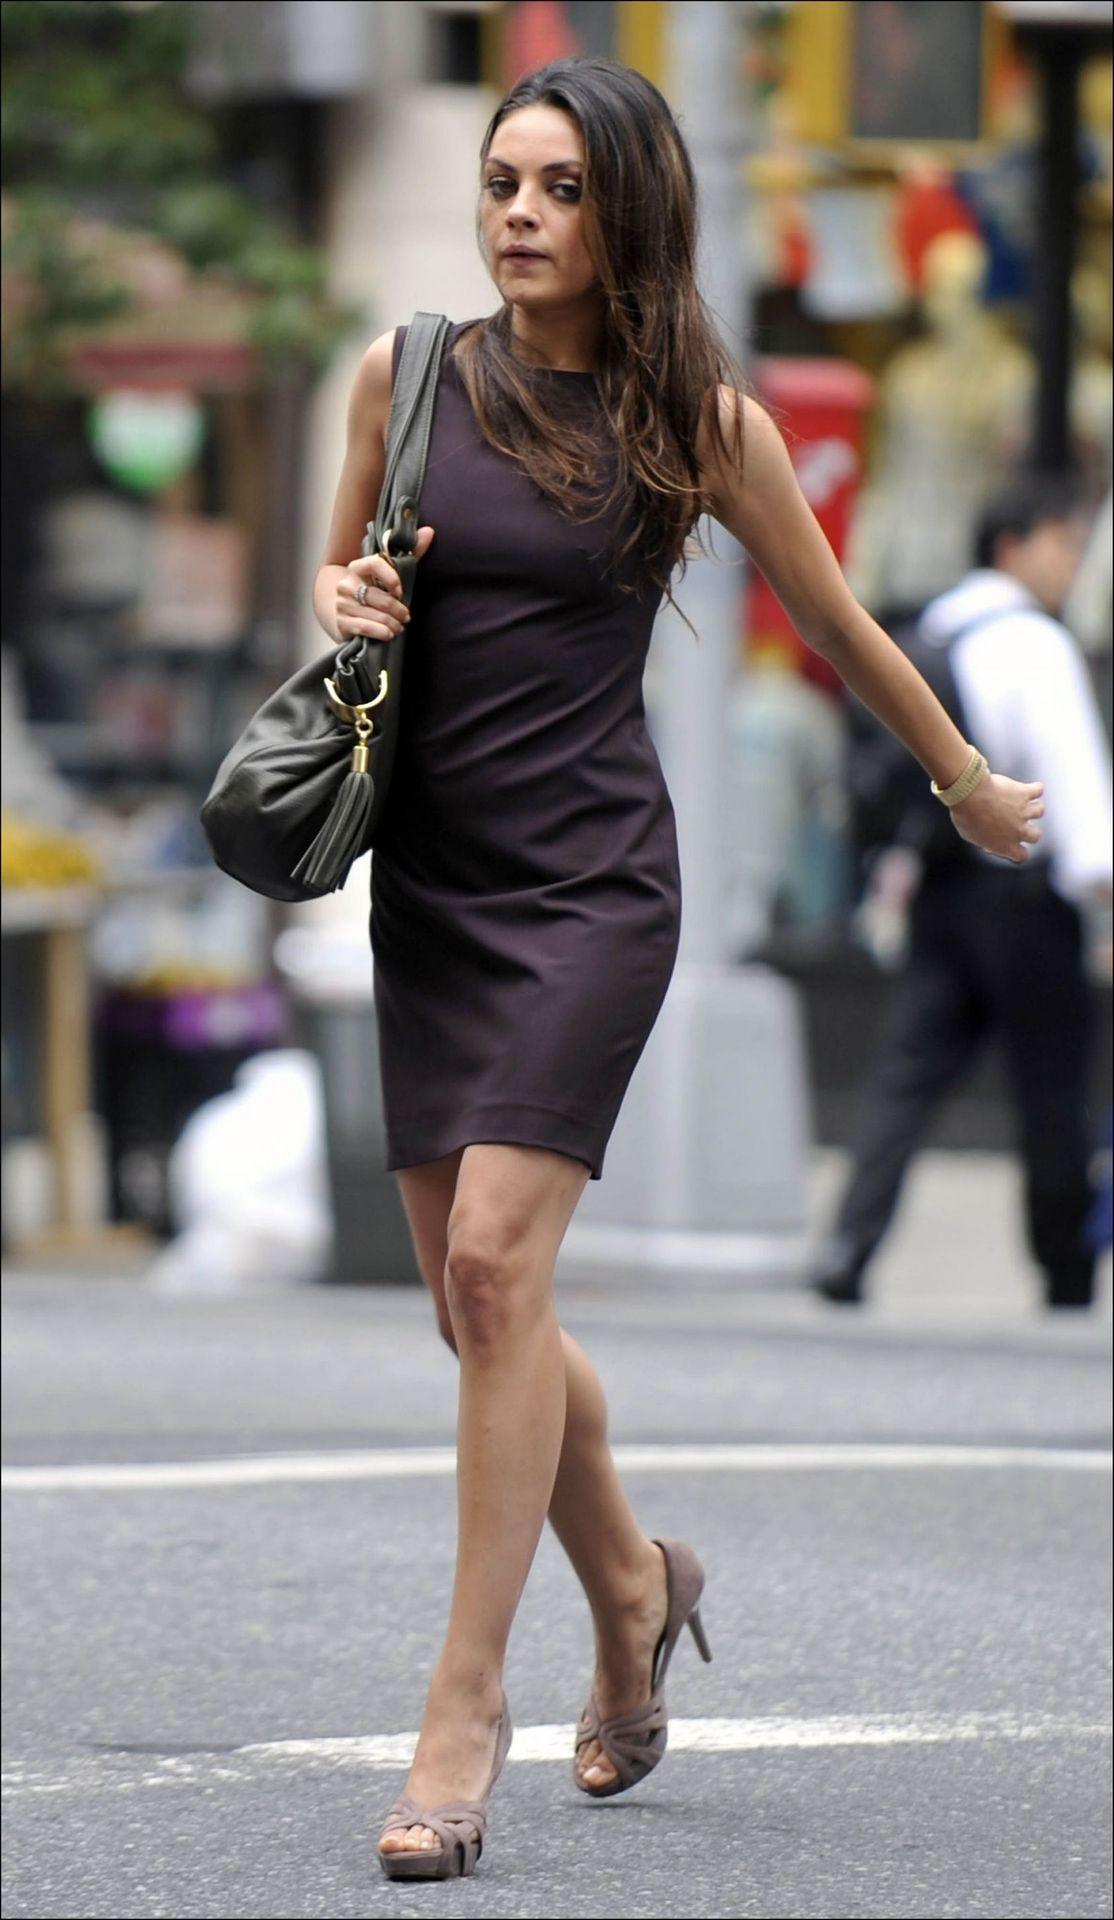 Mila Kunisstreet Style Celebrities Public Figures That I Love